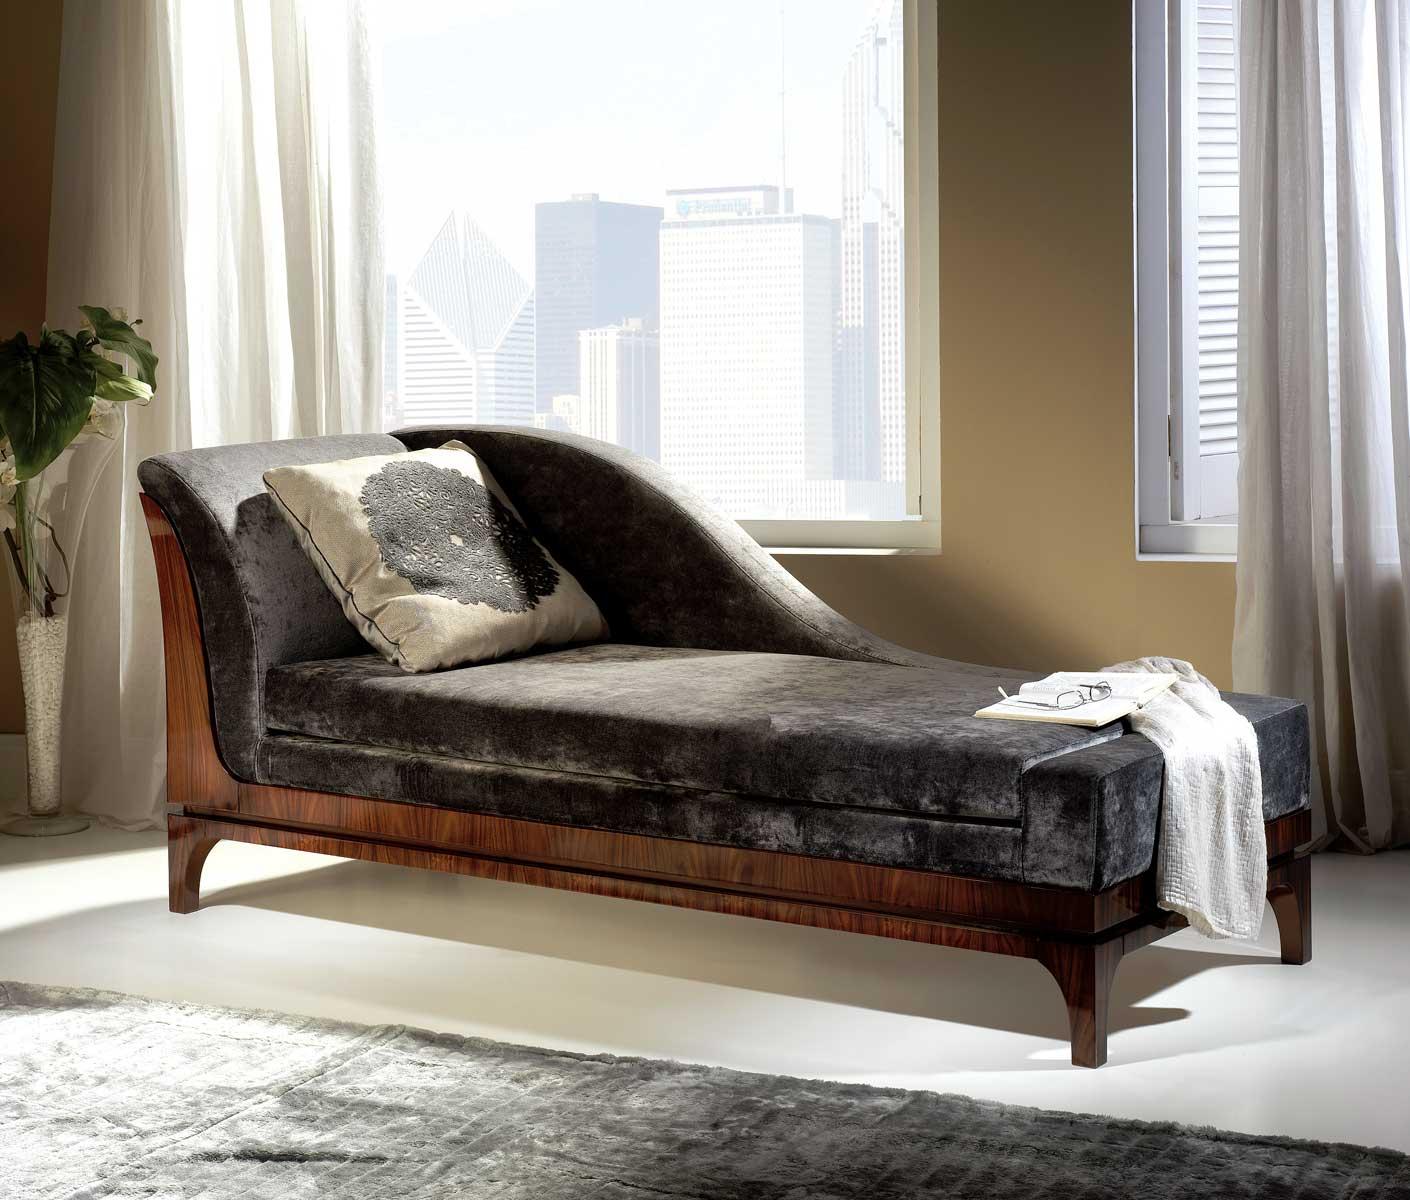 Tm 04 6 Bohemian Rosewood Chaise David Michael Furniture